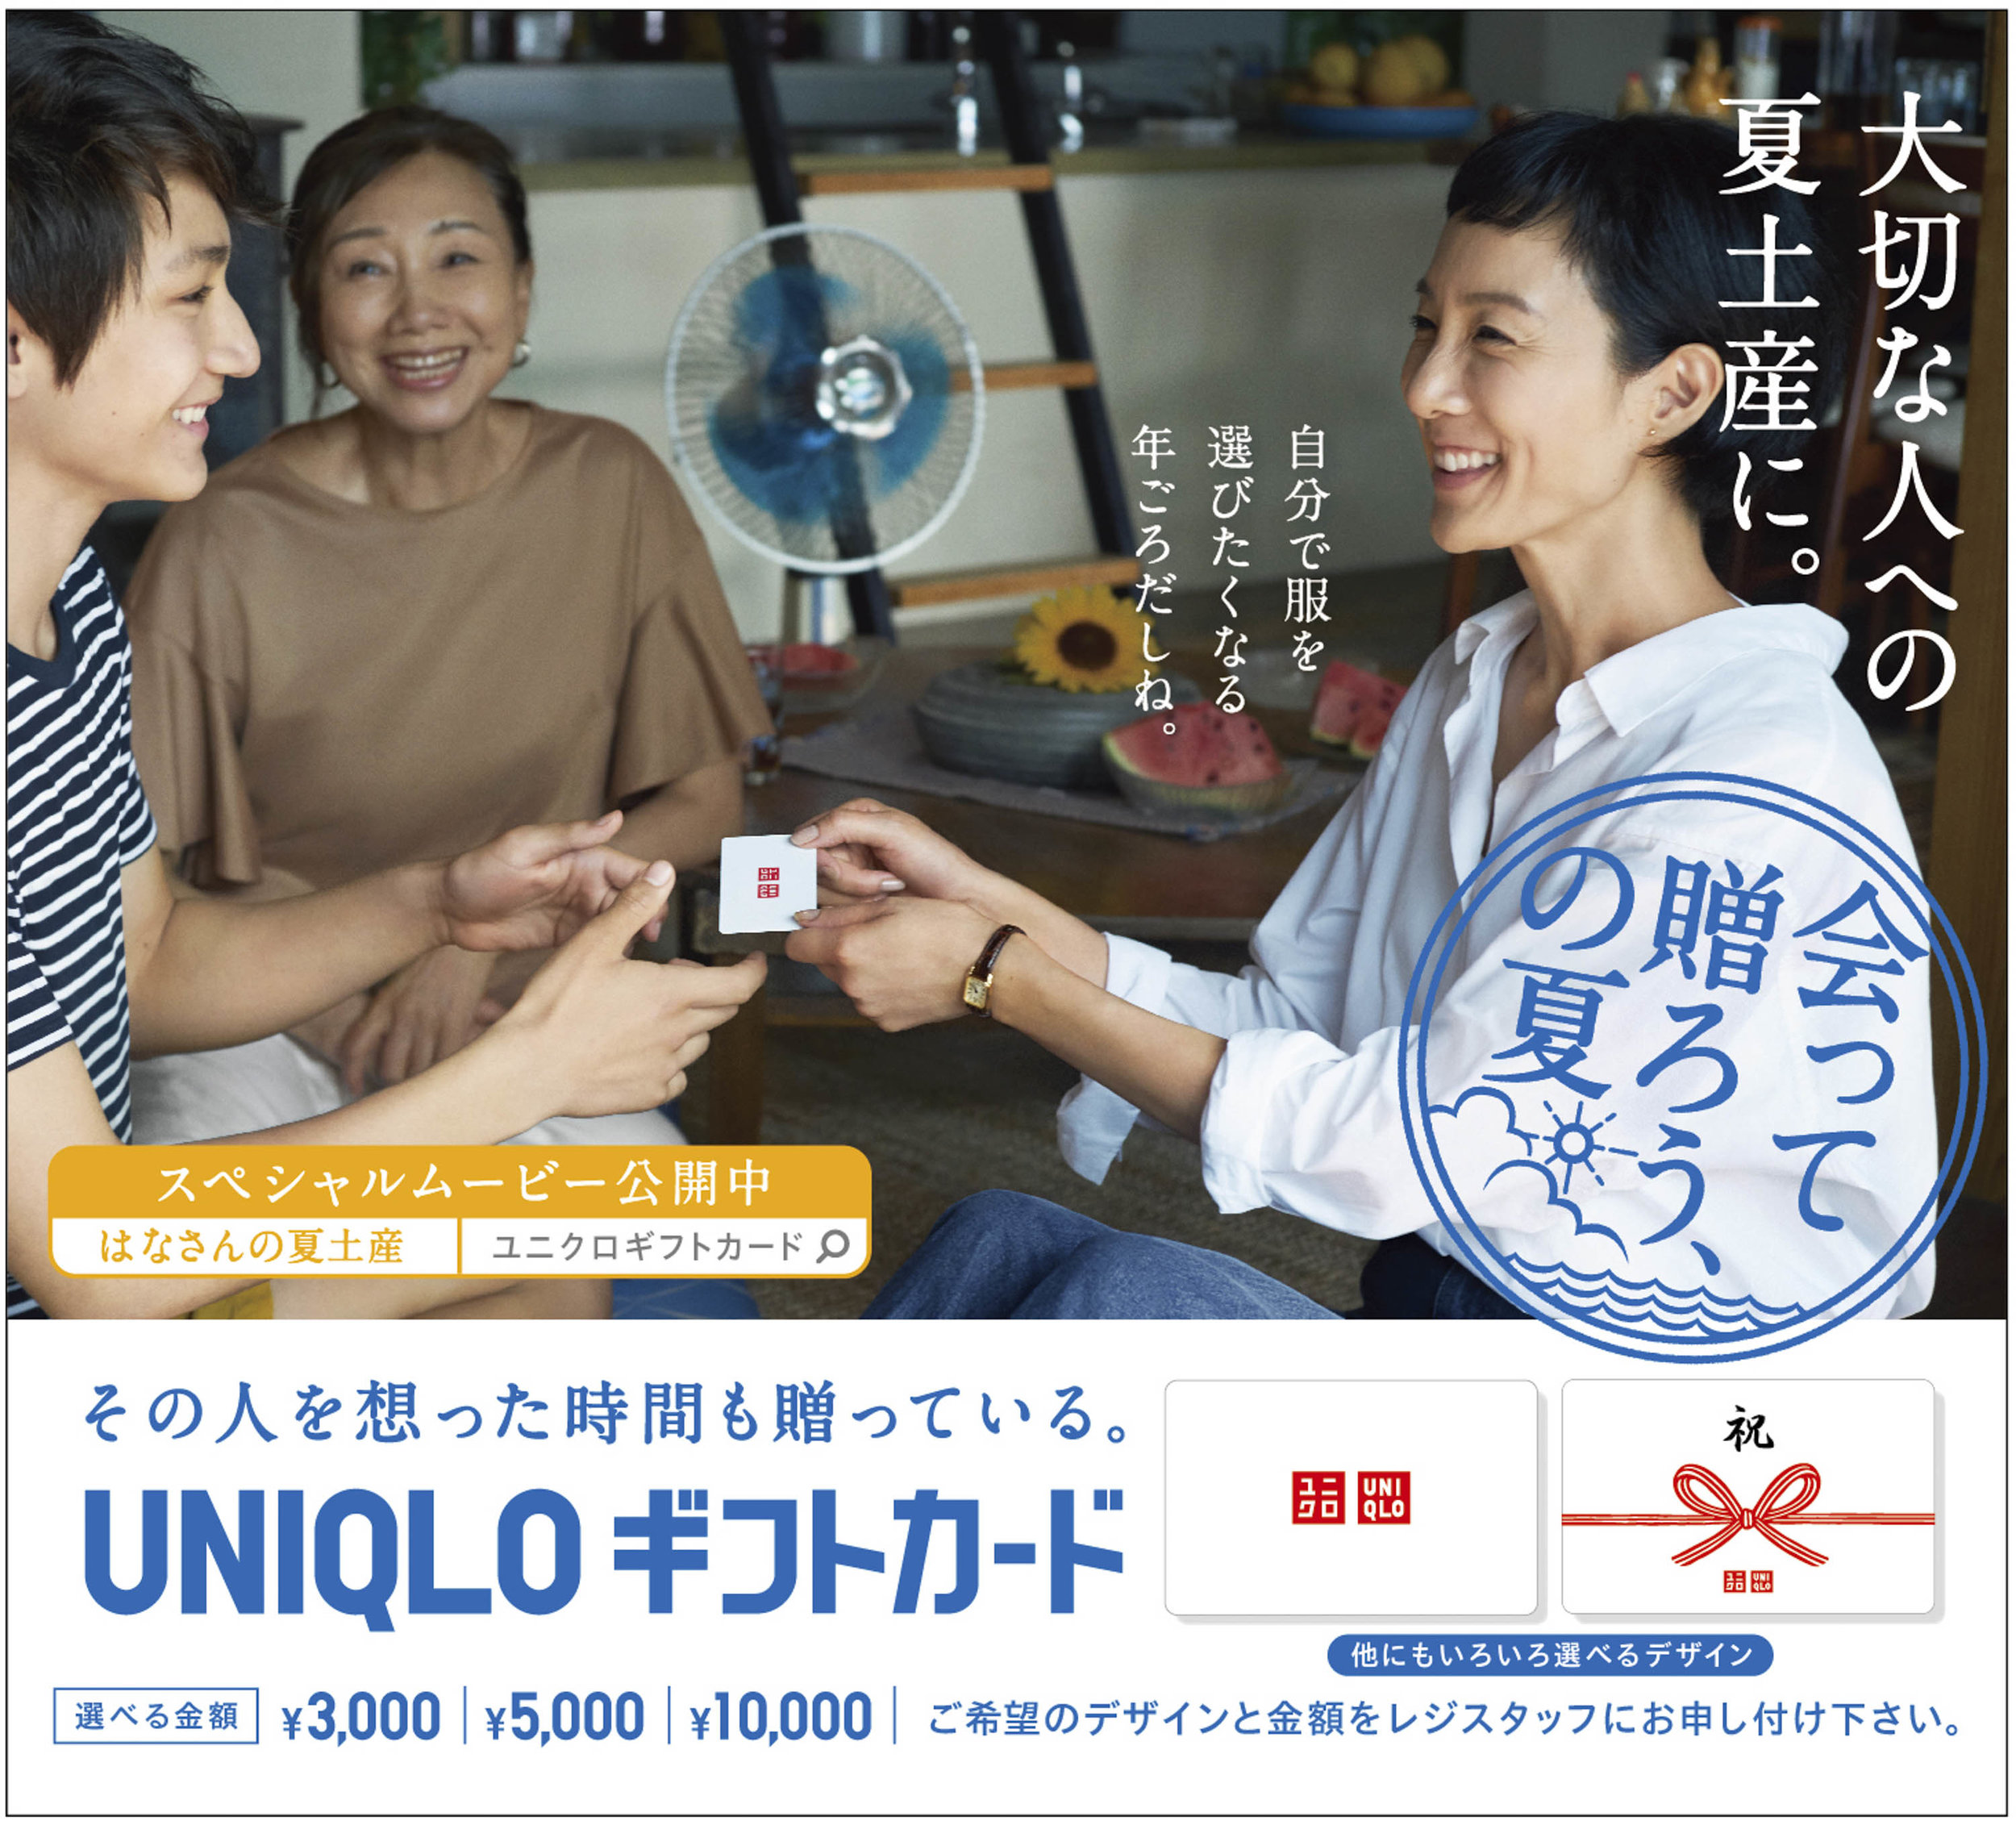 UNIQLOユニクロ【会って贈ろう、の夏】店内用POP_A